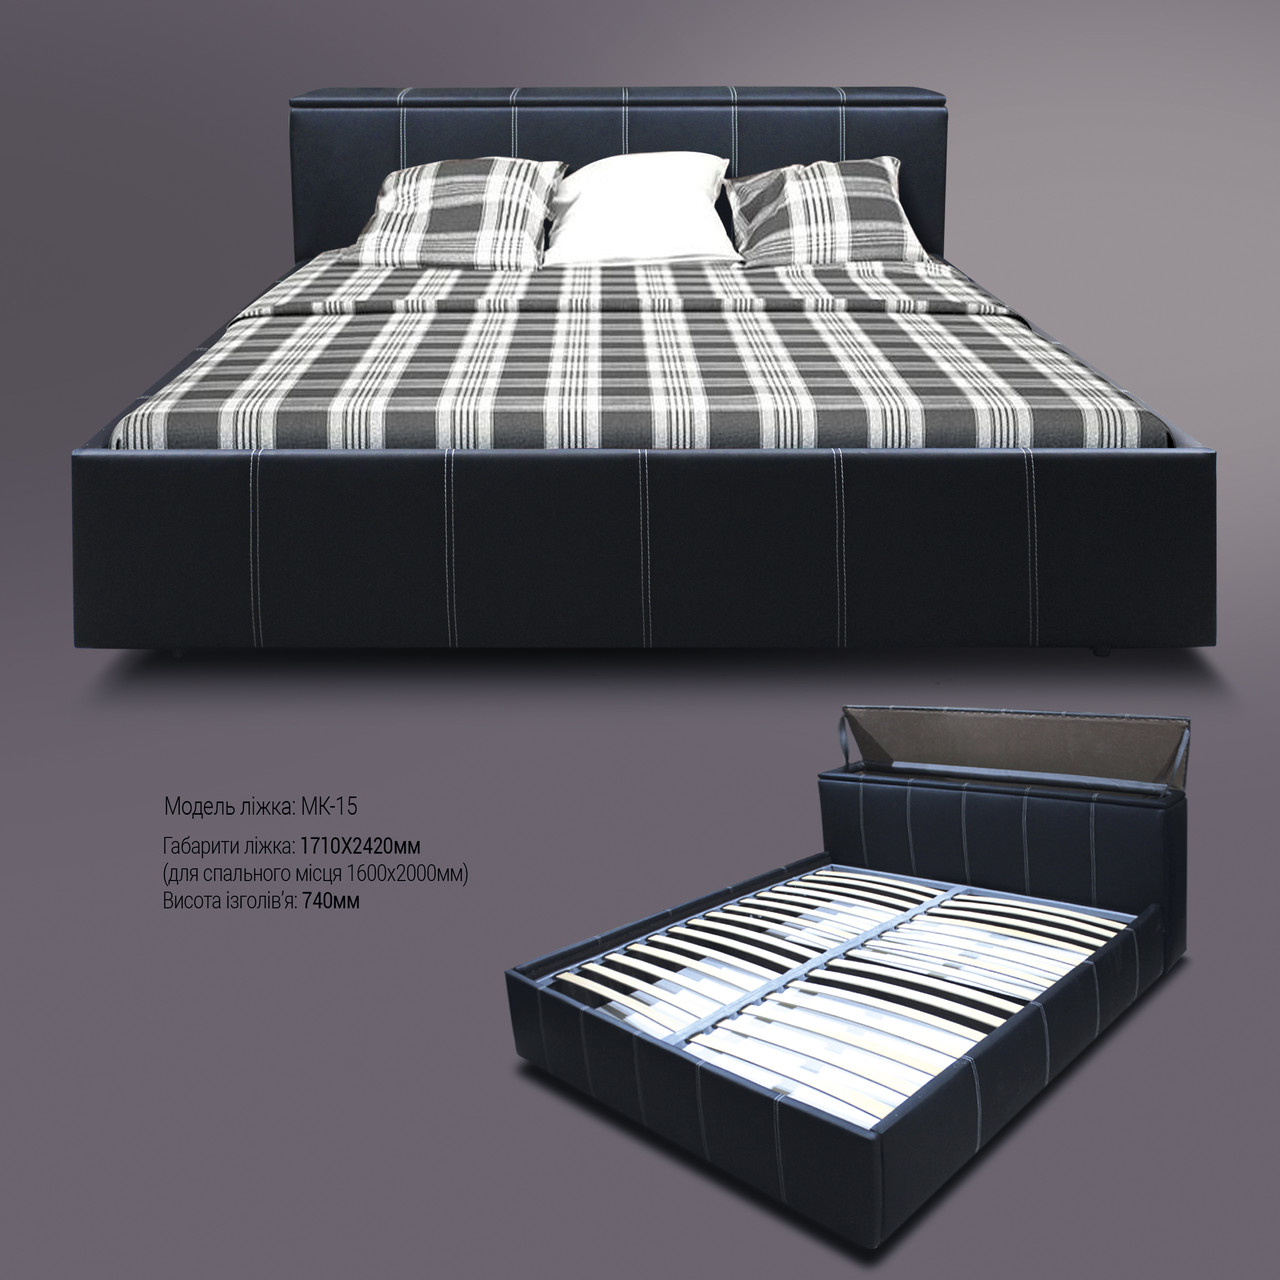 М'яке ліжко МК-15 MegaMebli